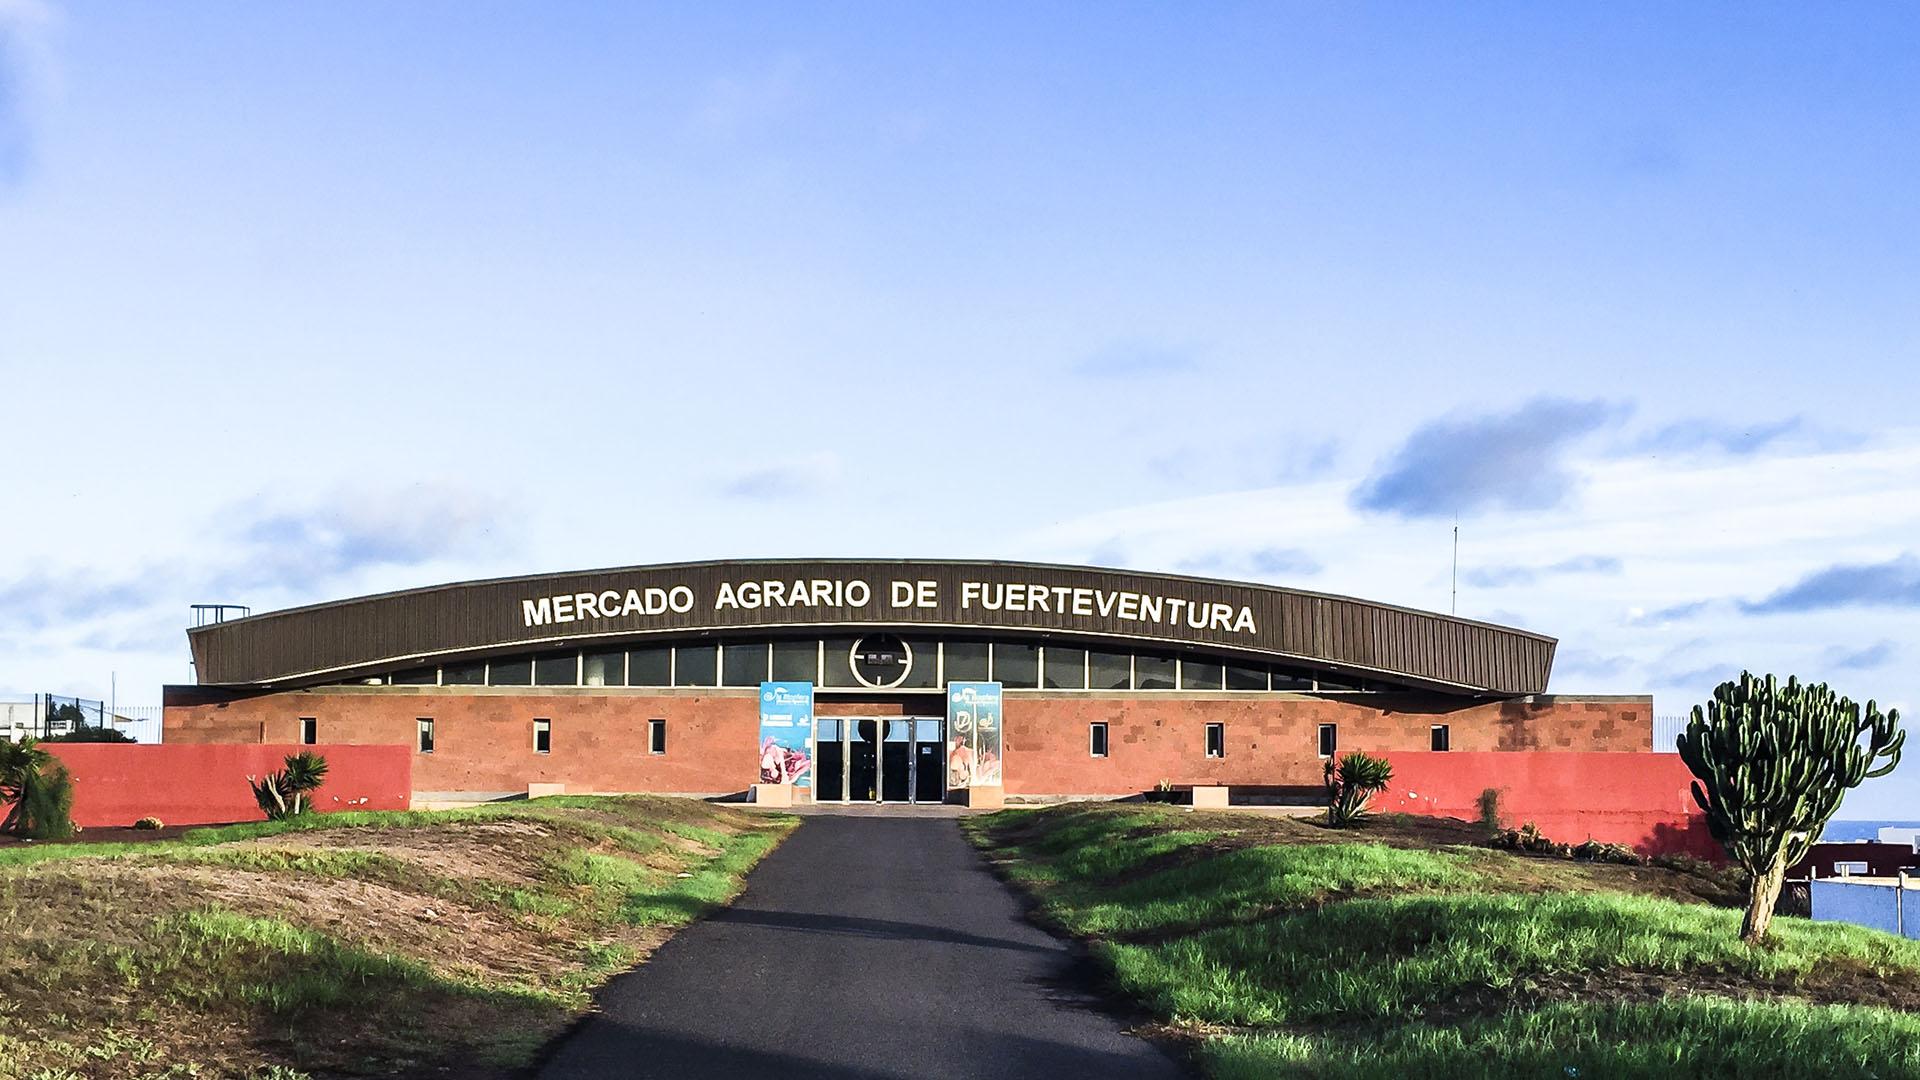 Der Mercado Agrario de Fuerteventura –der Biosphären Markt von Puerto del Rosario über dem Busterminal der Insel.